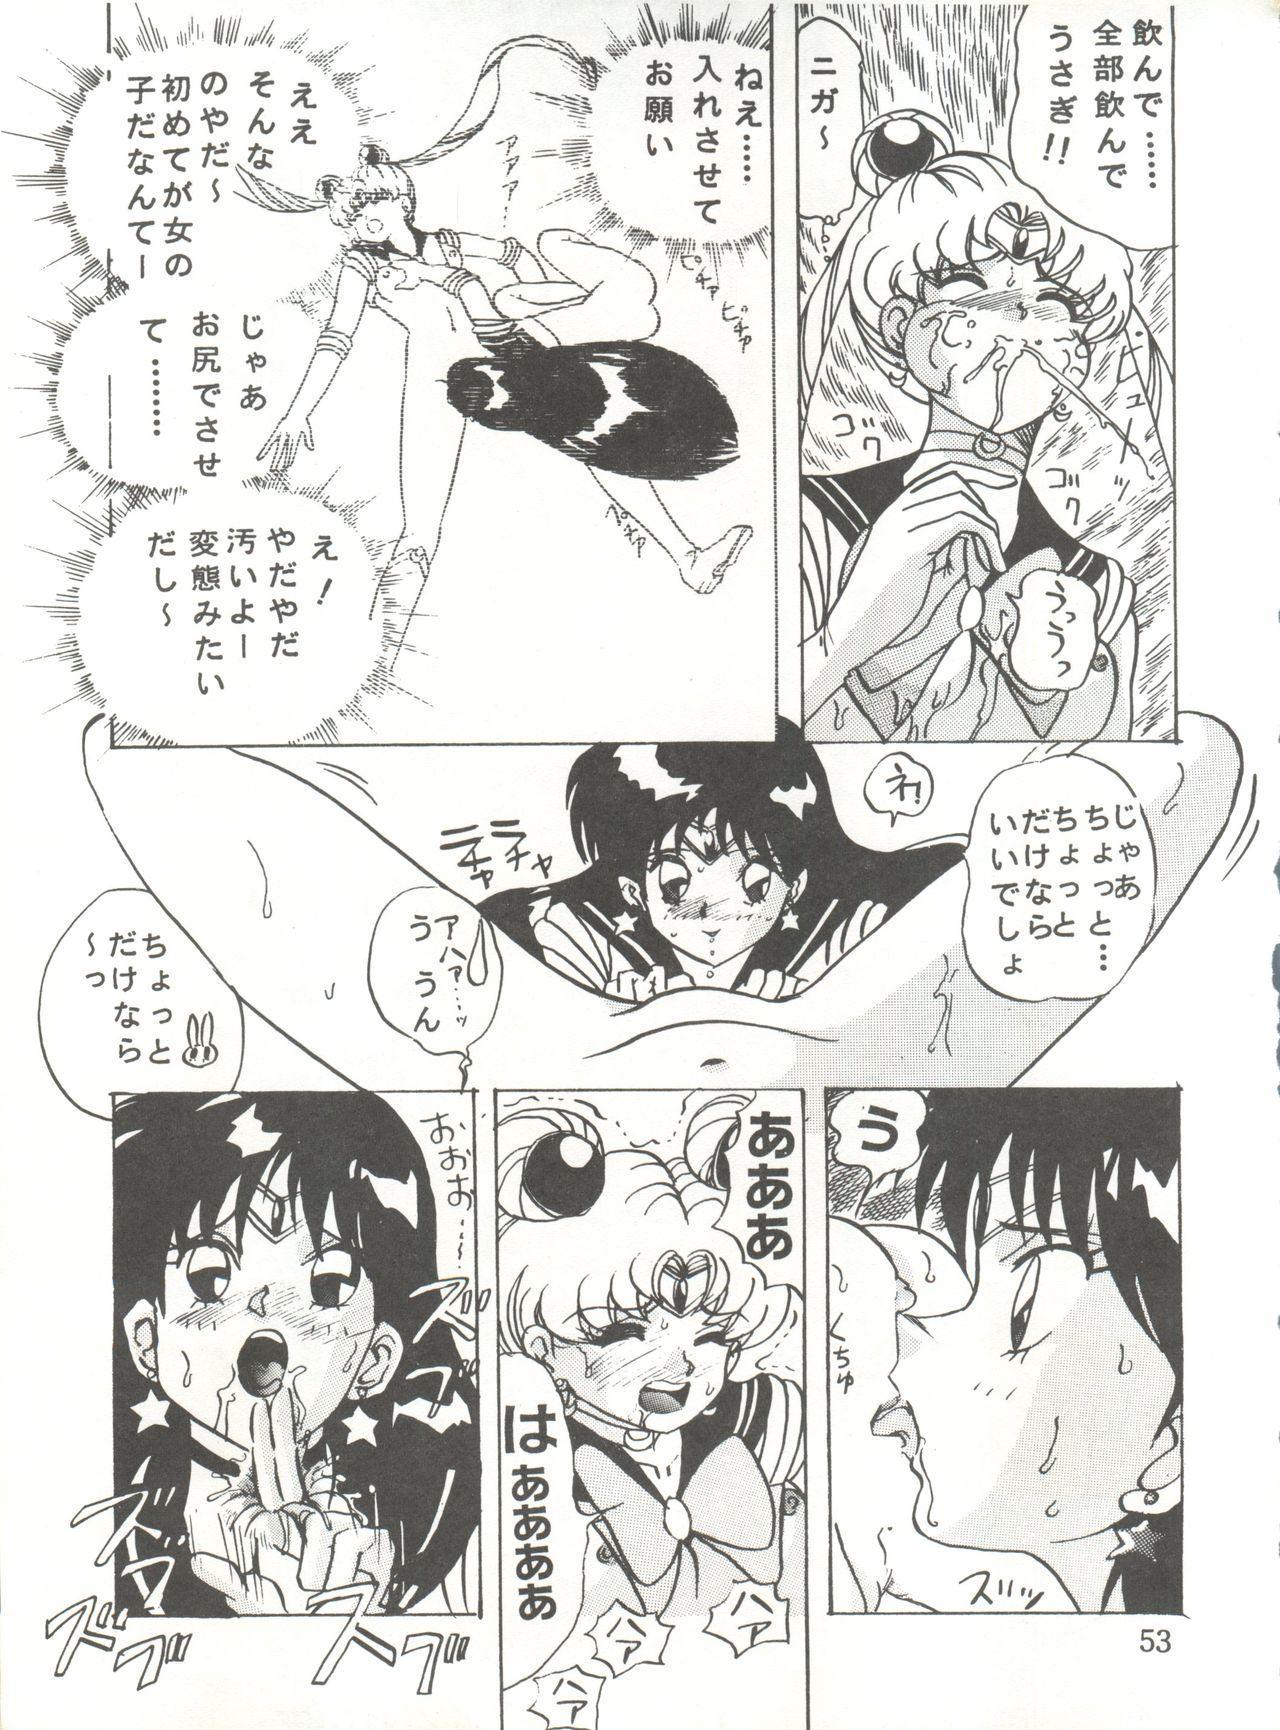 [Global One (MARO)] Sadistic 5 (Cutey Honey, Devilman, Sailor Moon), [Global One (MARO)] Sadistic (Dirty Pair, Fushigi no Umi no Nadia, Sailor Moon), [Studio Ikkatsumajin] .ribbon (Hime-chan's Ribbon) 52